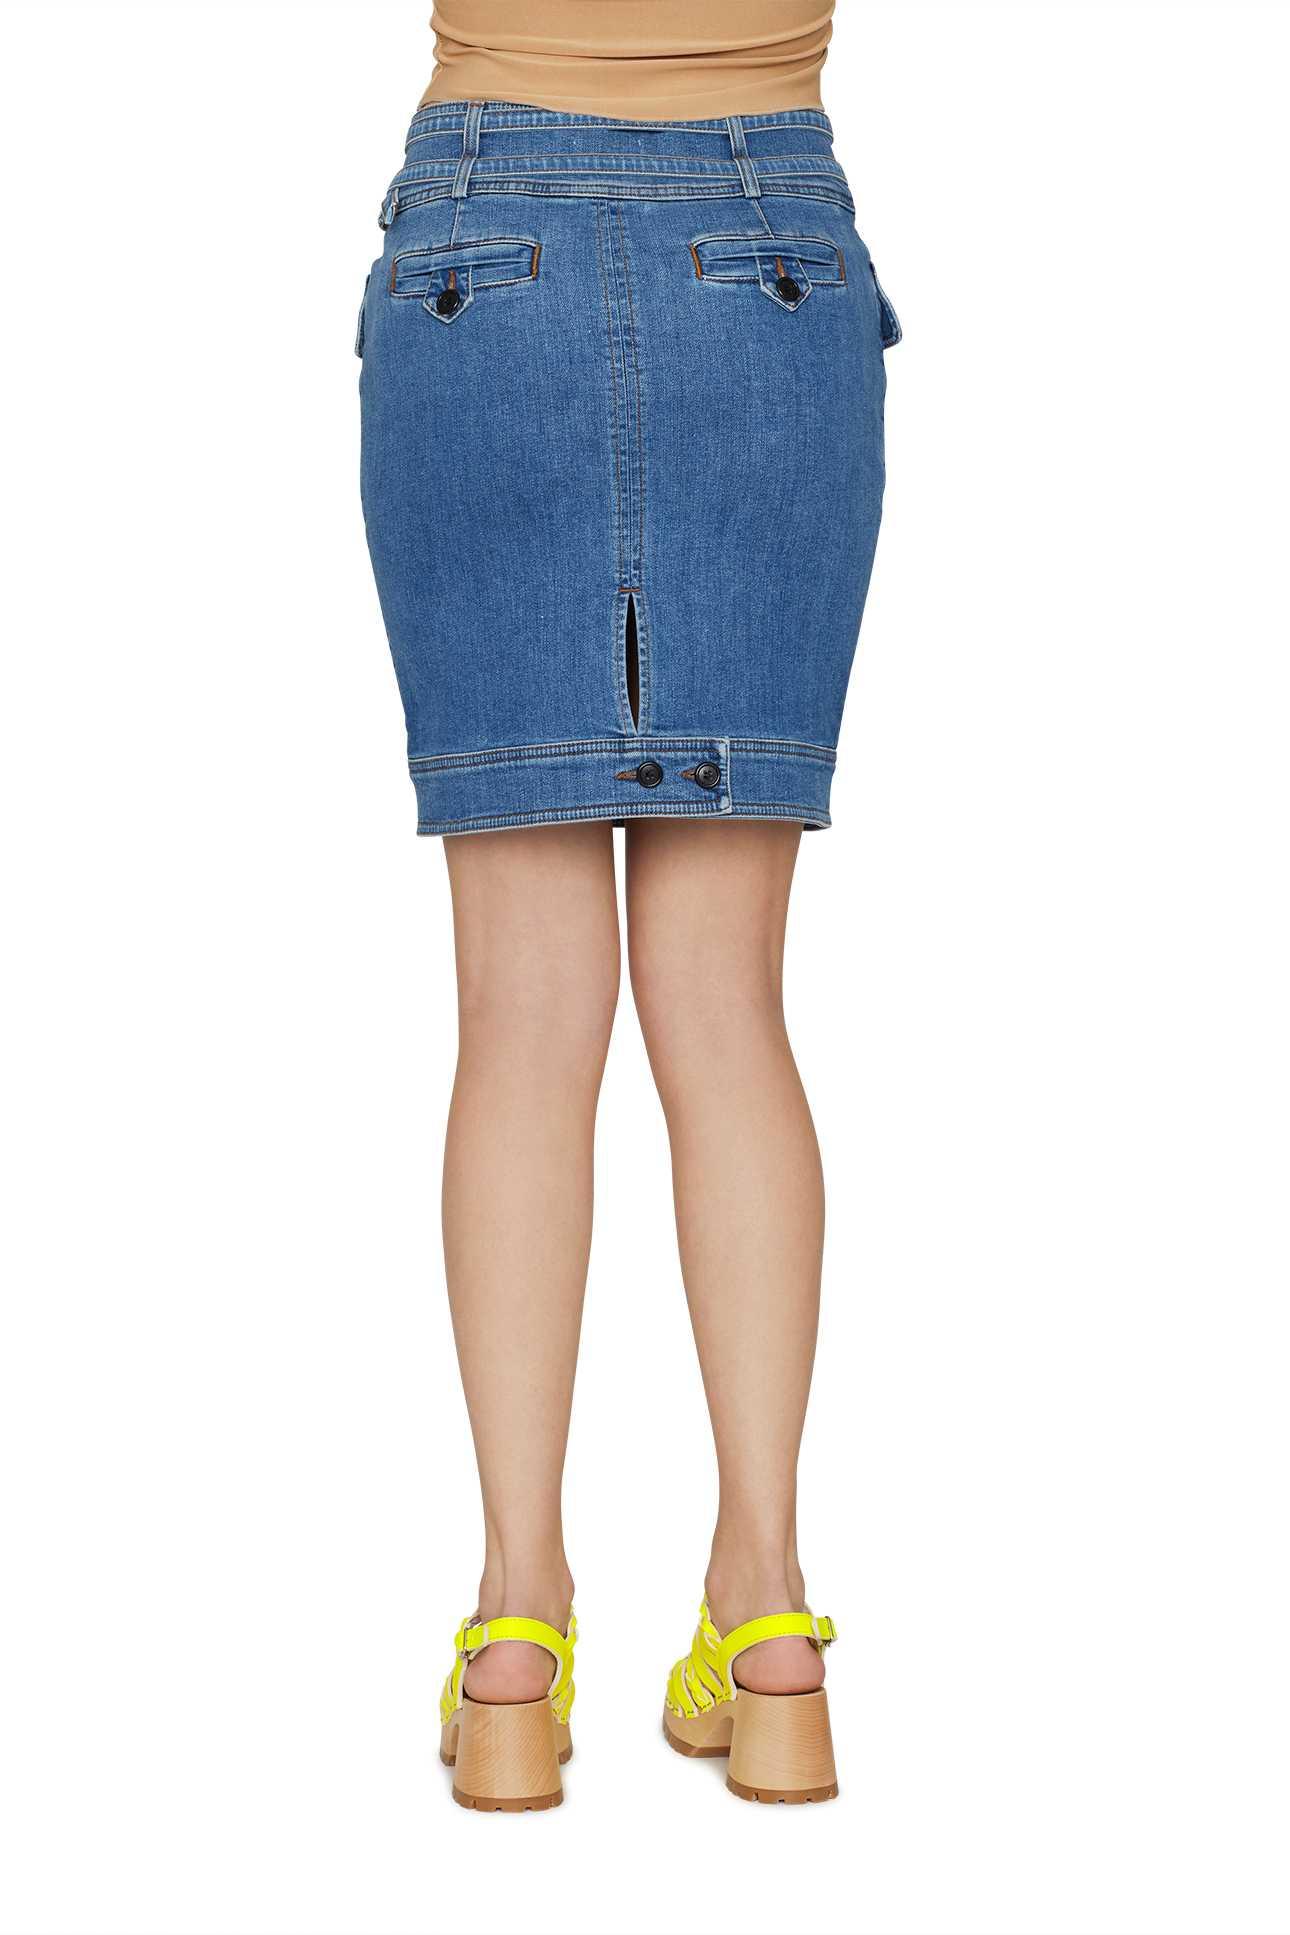 Product image Cargo Skirt